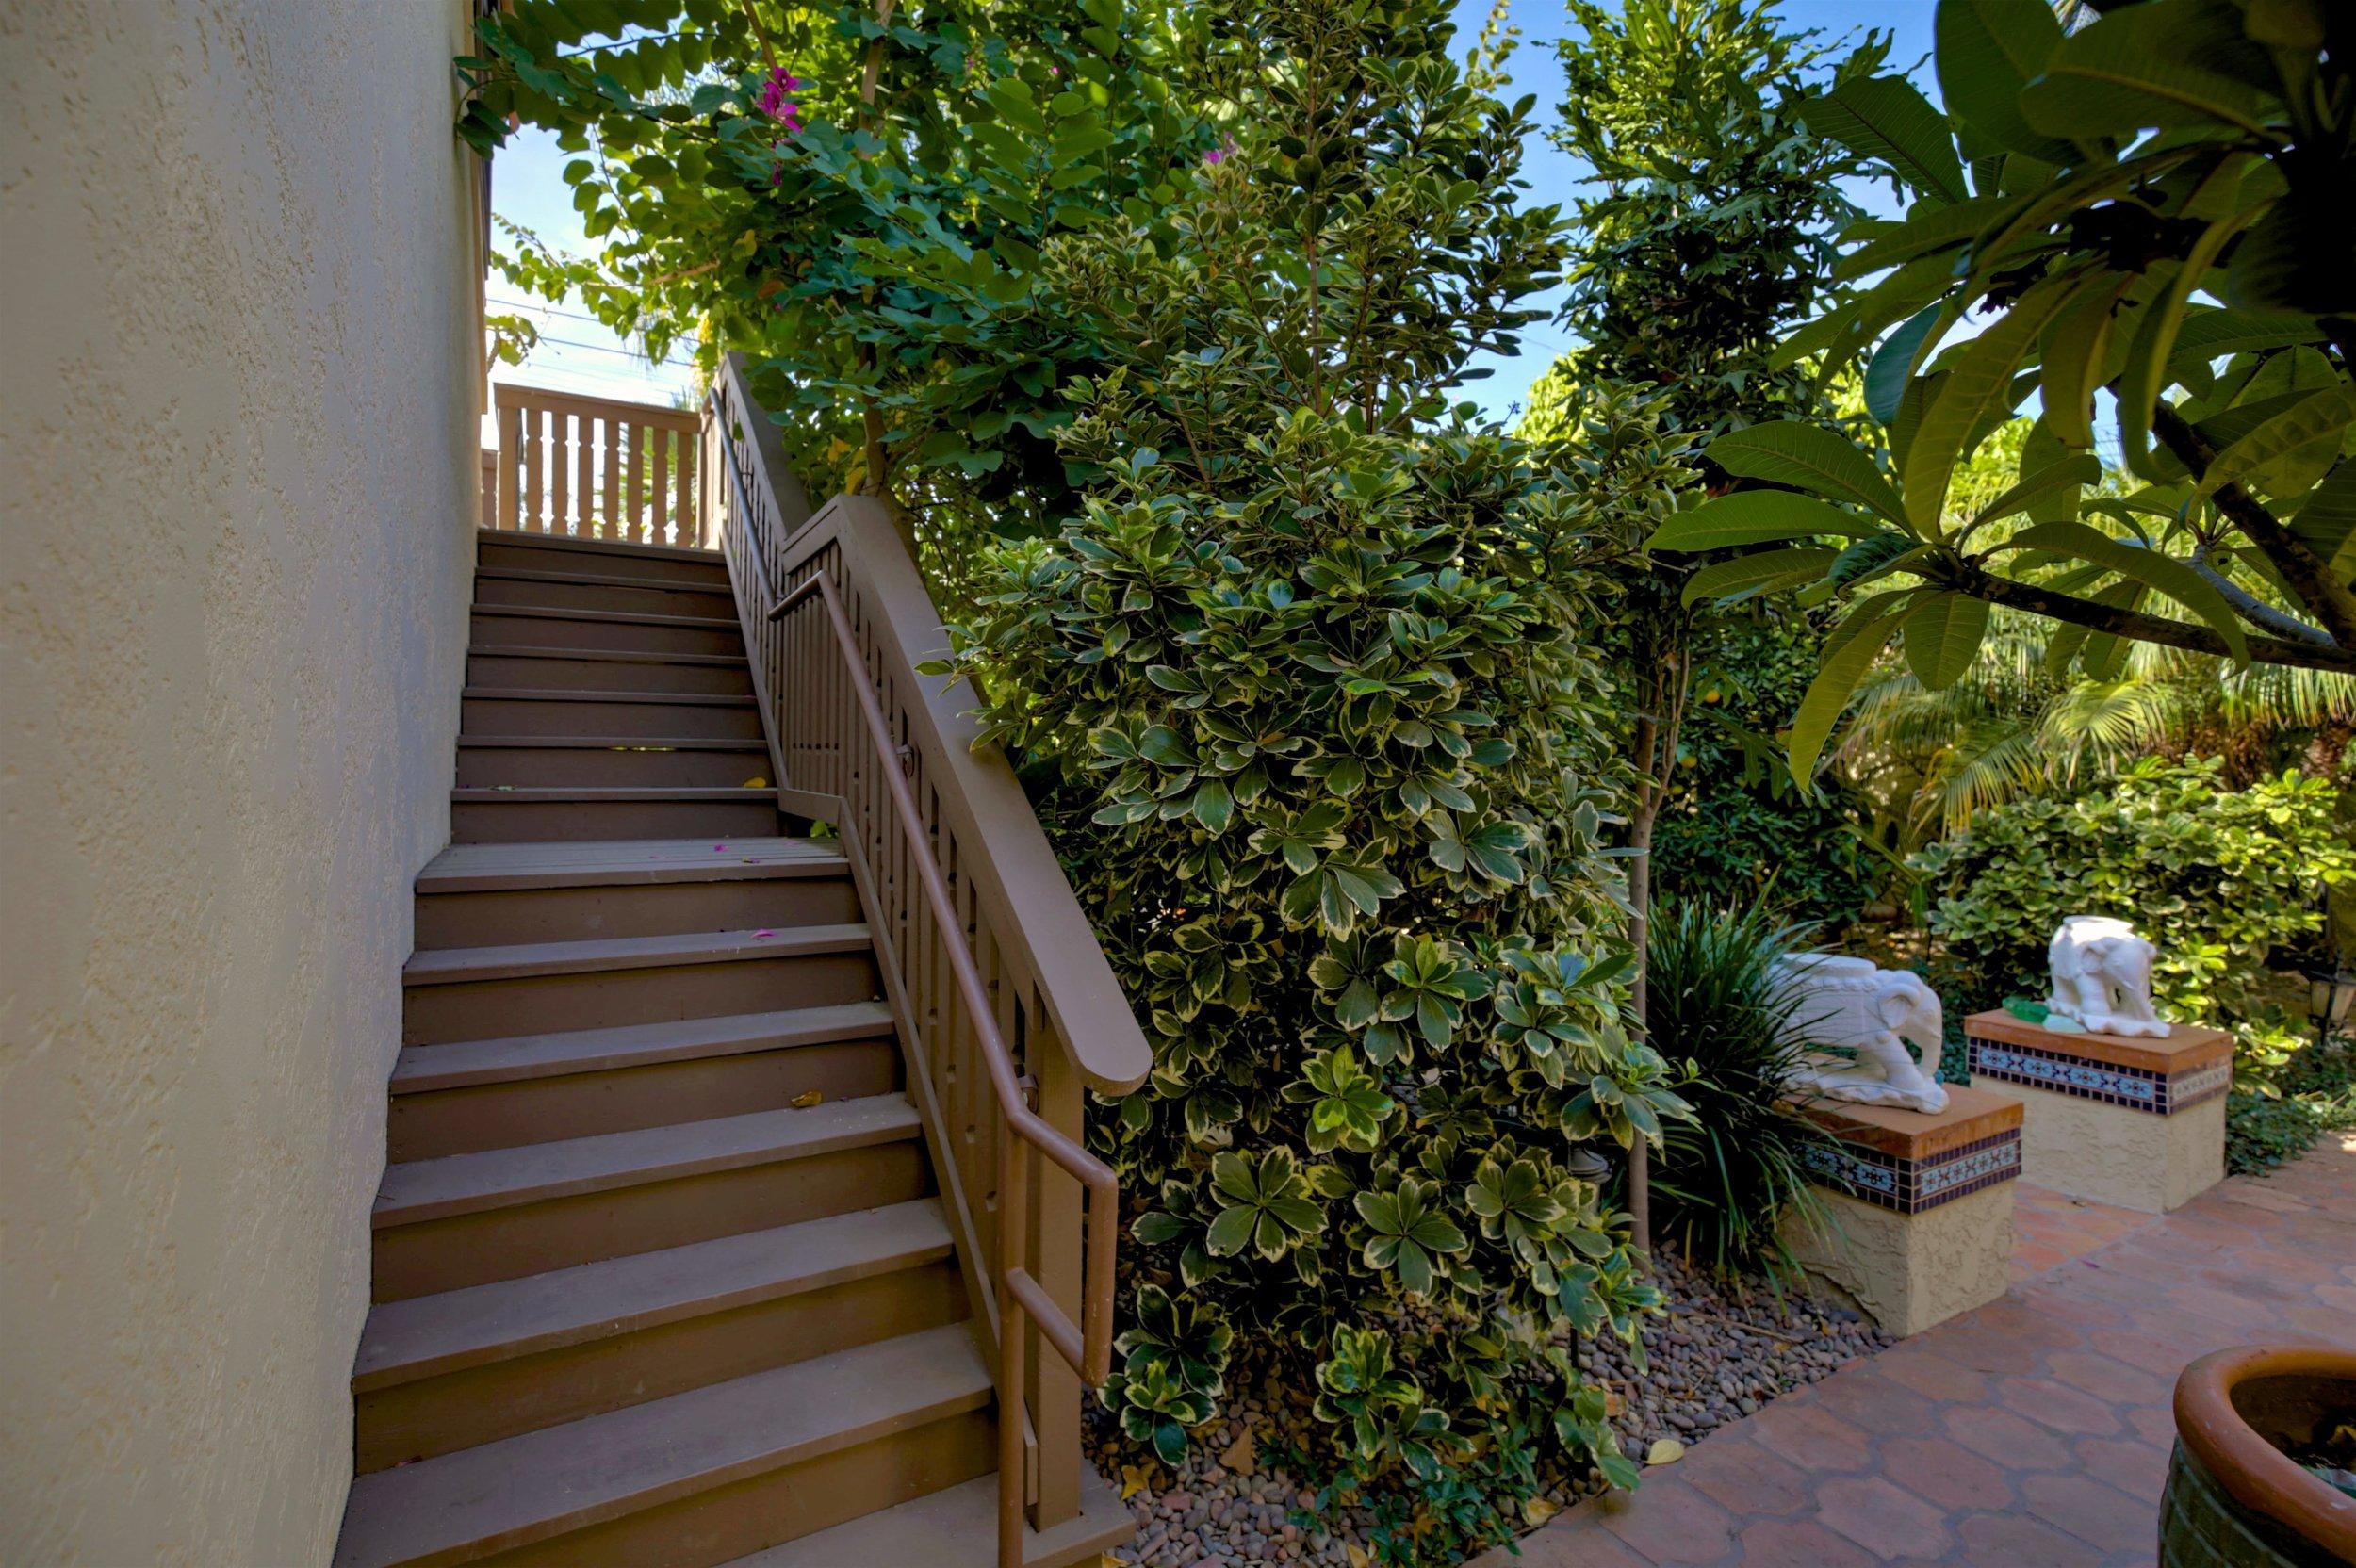 243 Euclid Ave Long Beach CA-print-084-51-243Euclid 084-4200x2796-300dpi.jpg